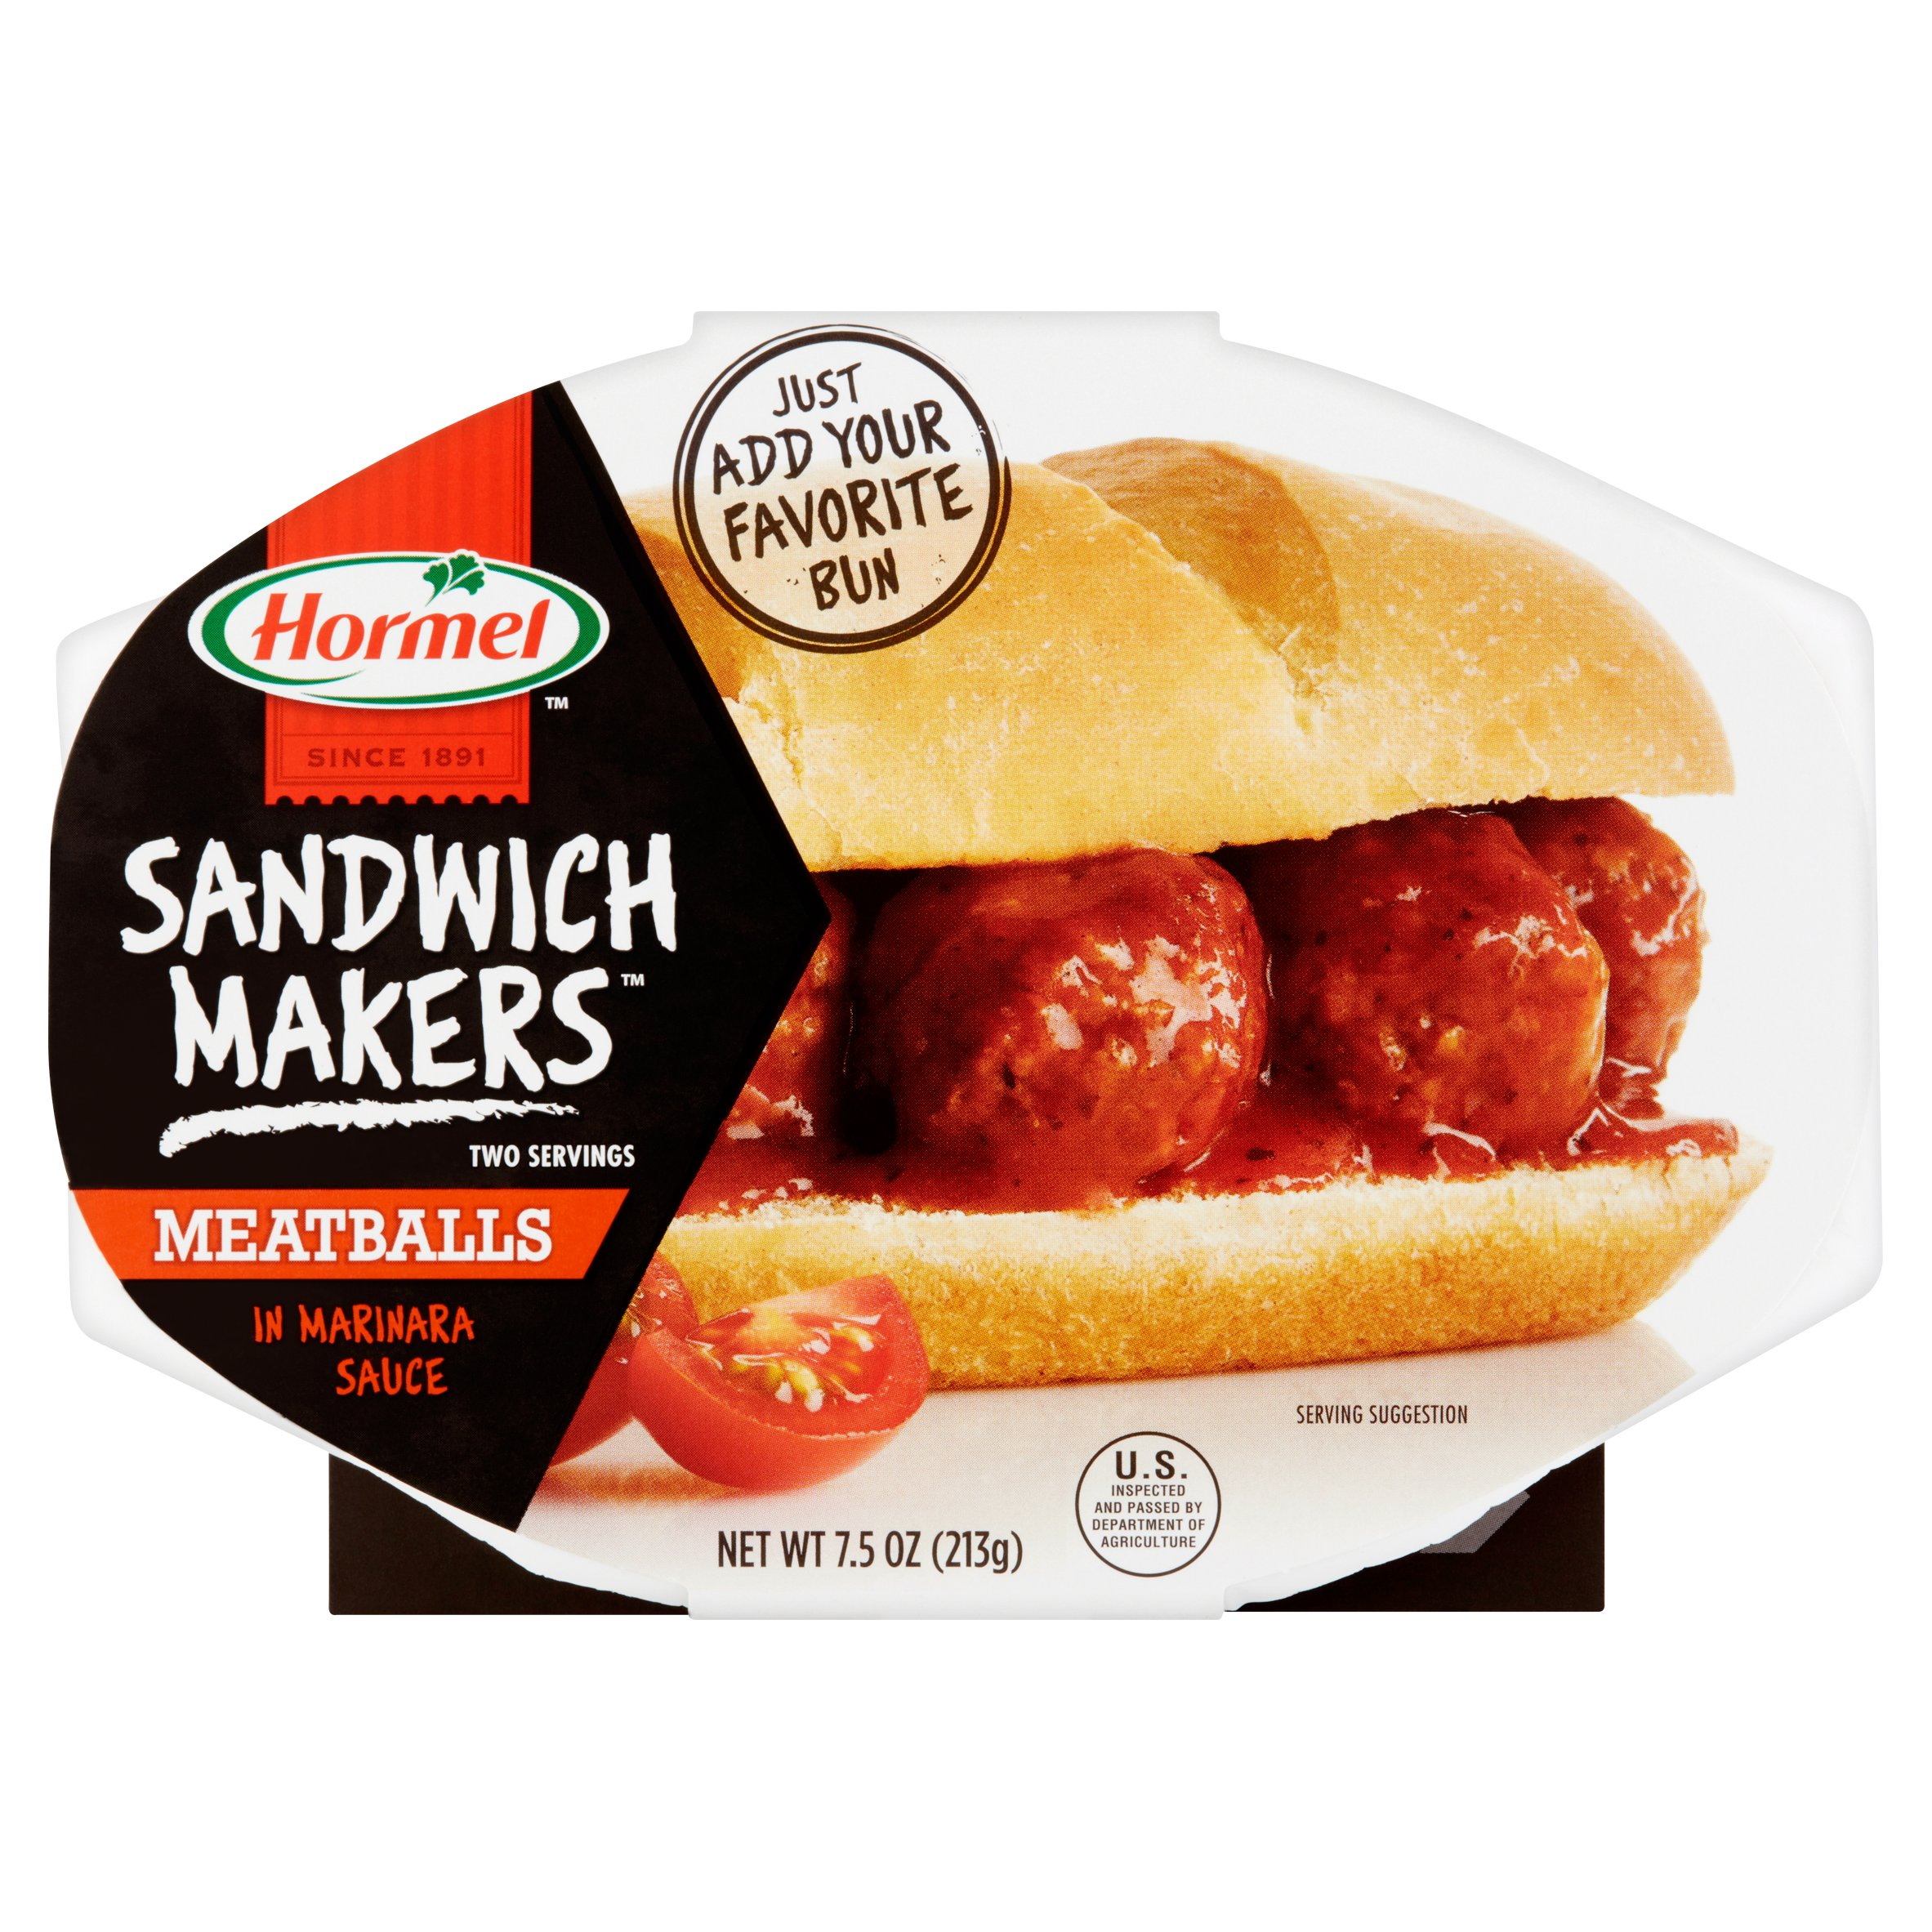 Hormel Sandwich Makers Meatballs in Marinara Sauce, 7.5 oz by Hormel Foods Sales, LLC